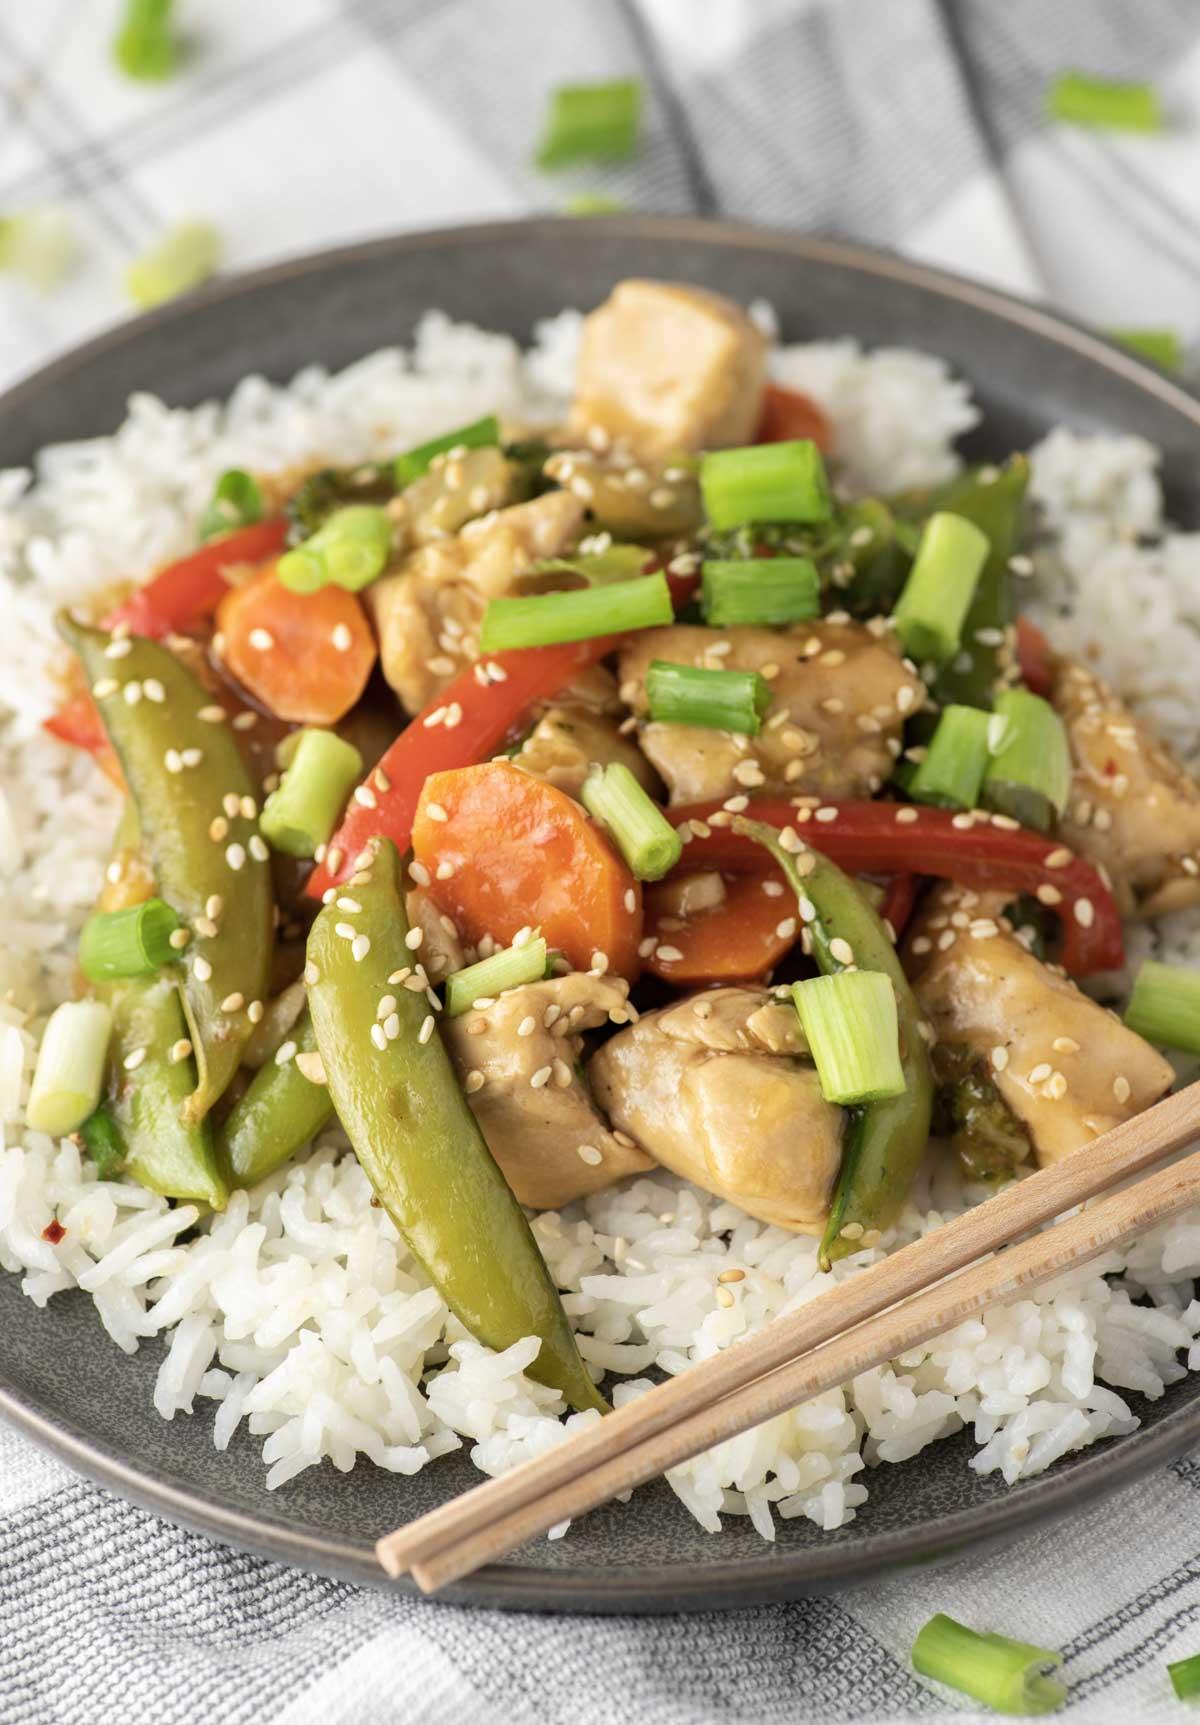 chicken and veggie stir fry on plate